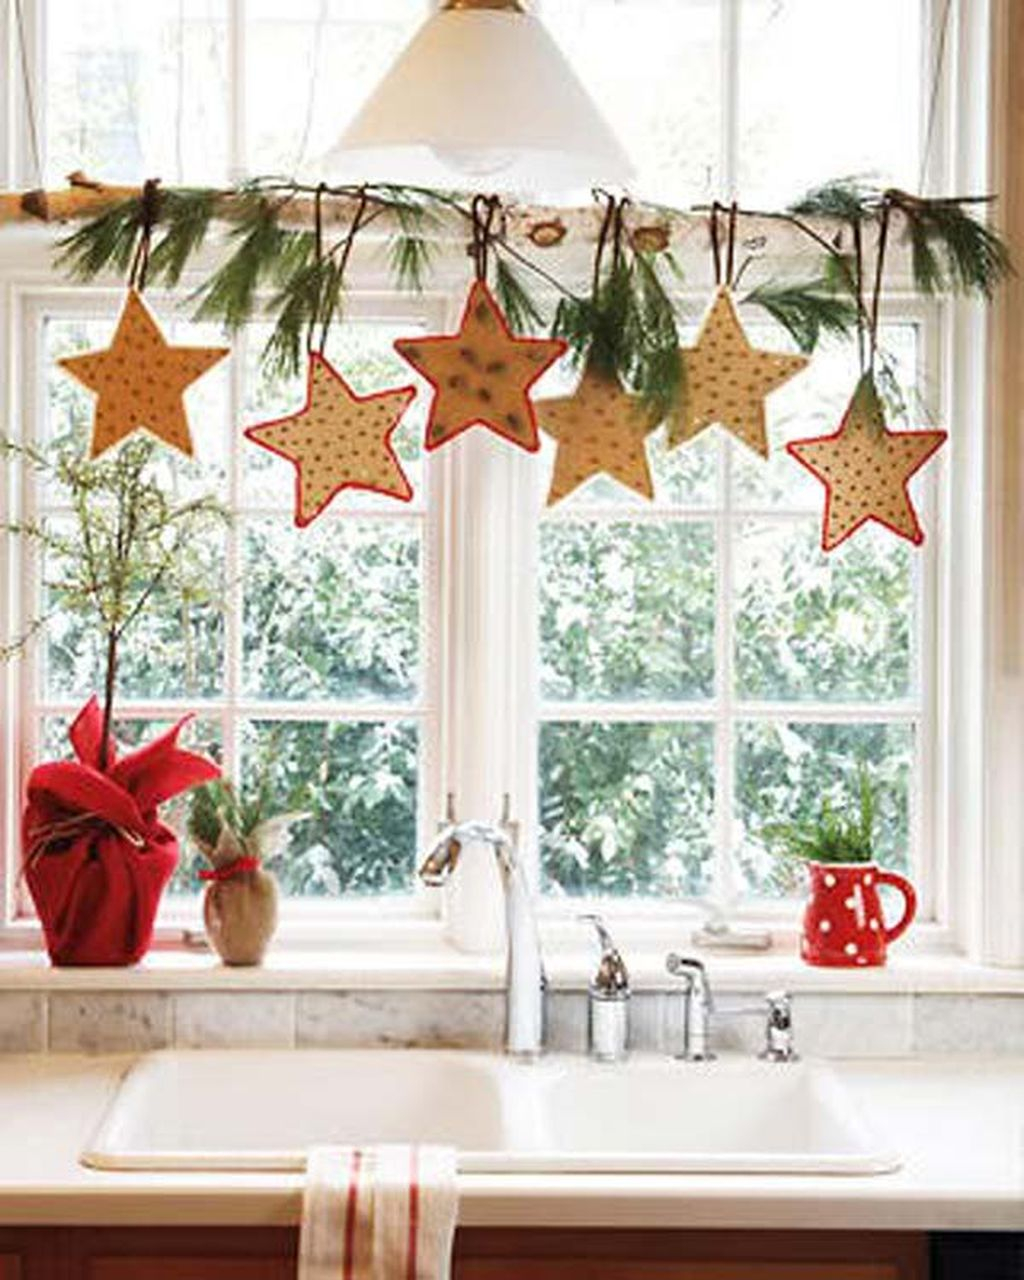 Adorable Rustic Christmas Kitchen Decoration Ideas 25